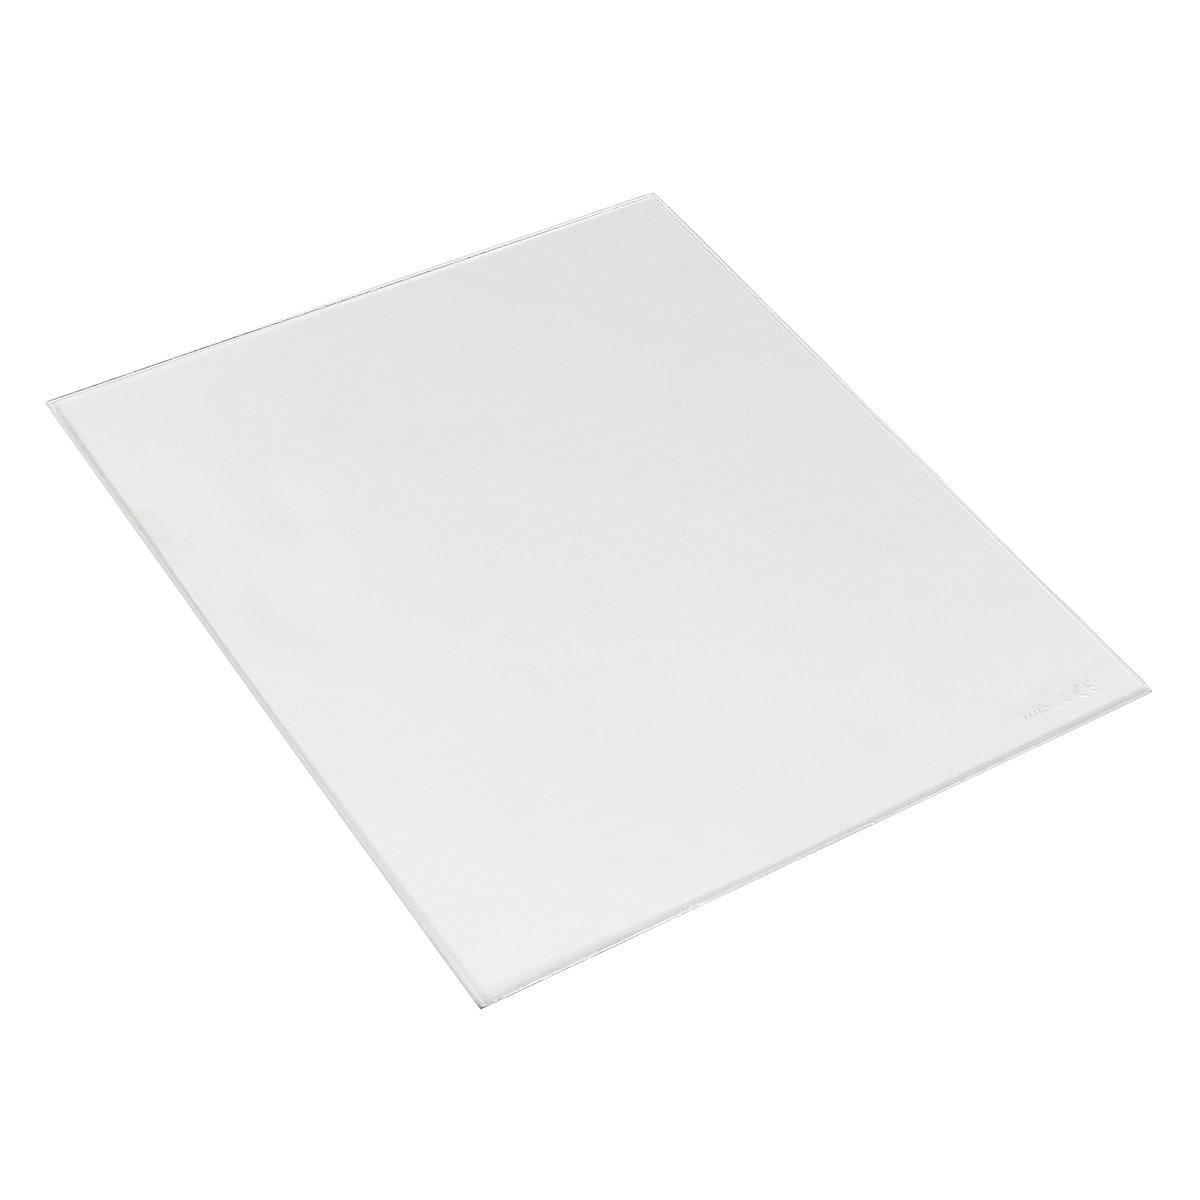 Äußeres Schutzglas Telwin 134 x 114 mm